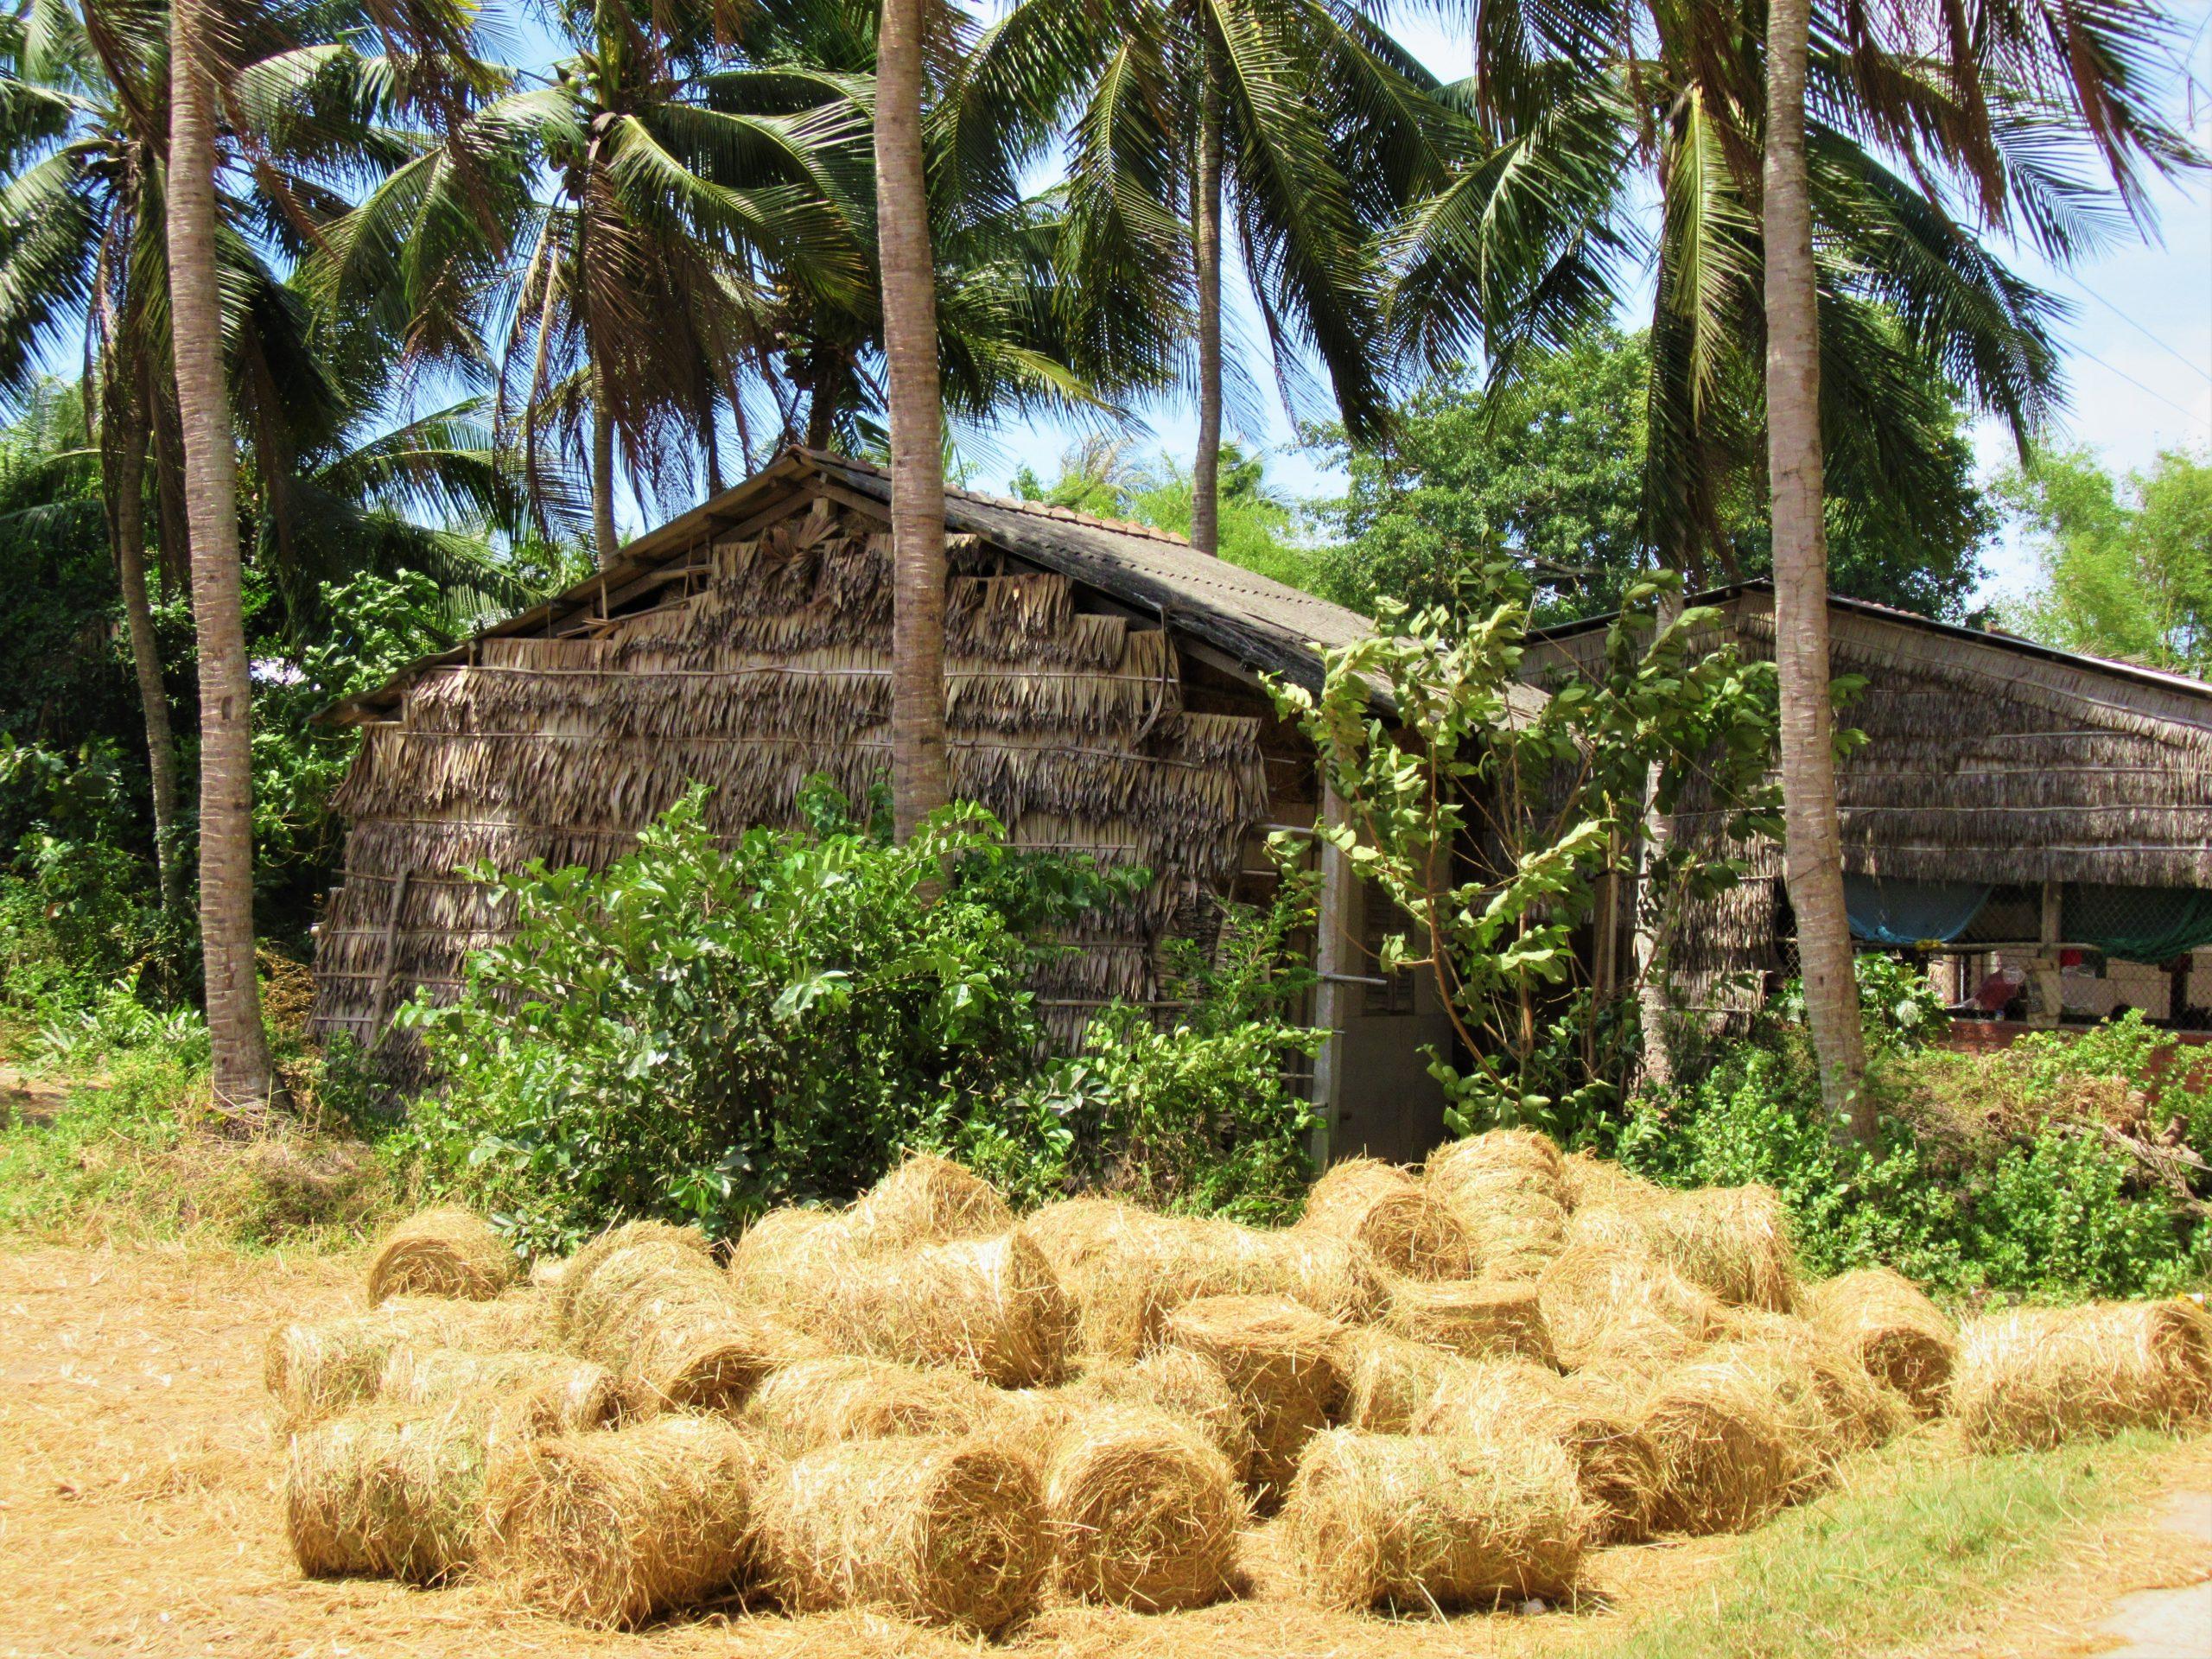 Hay rolls & farmhouse, Tra Vinh Province, Mekong Delta, Vietnam